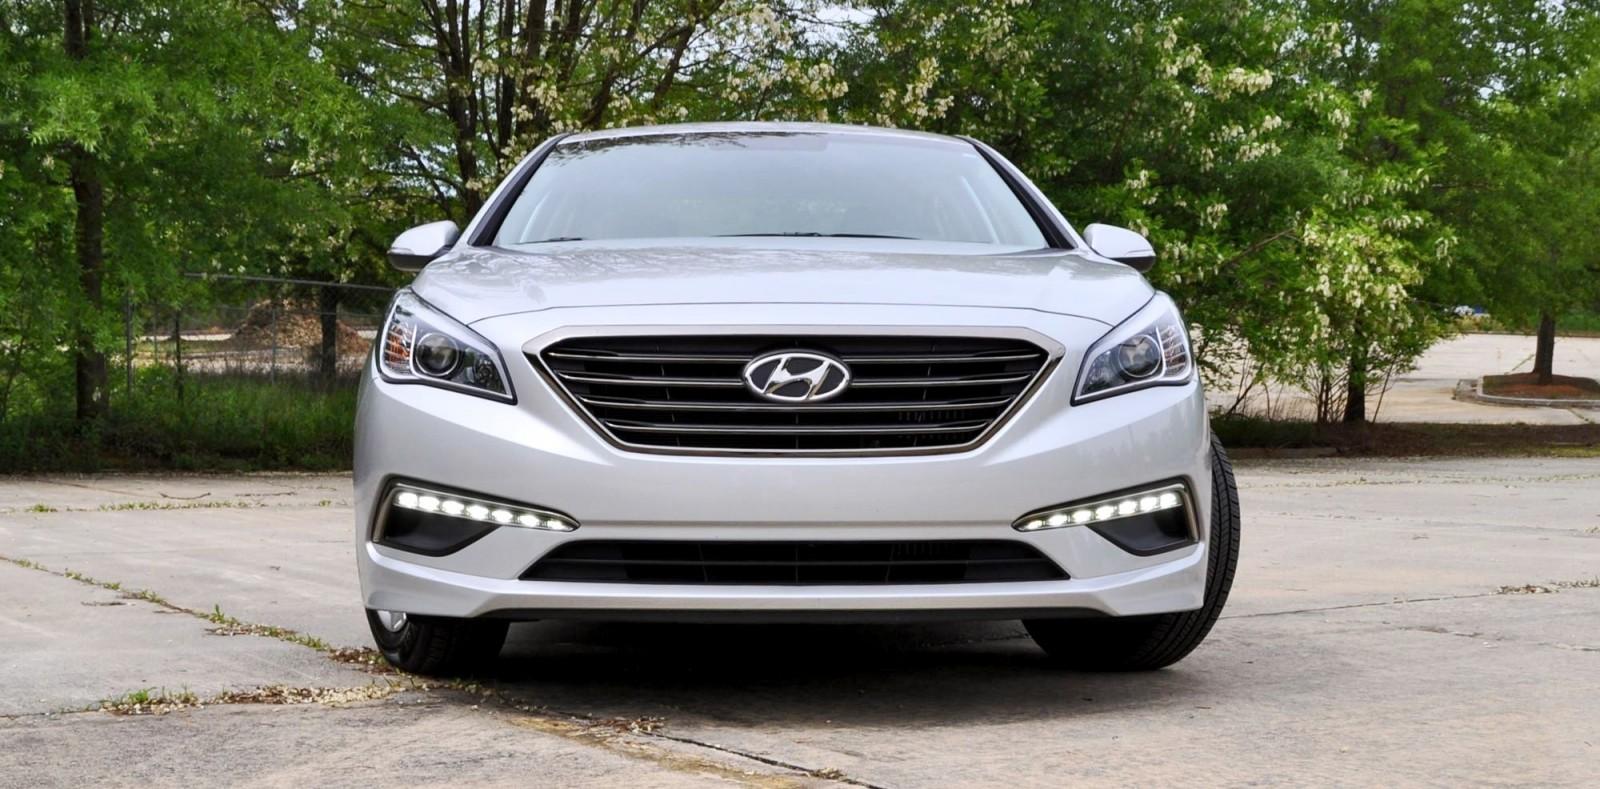 2015 Hyundai Sonata ECO Review 19   2015 Hyundai Sonata Eco